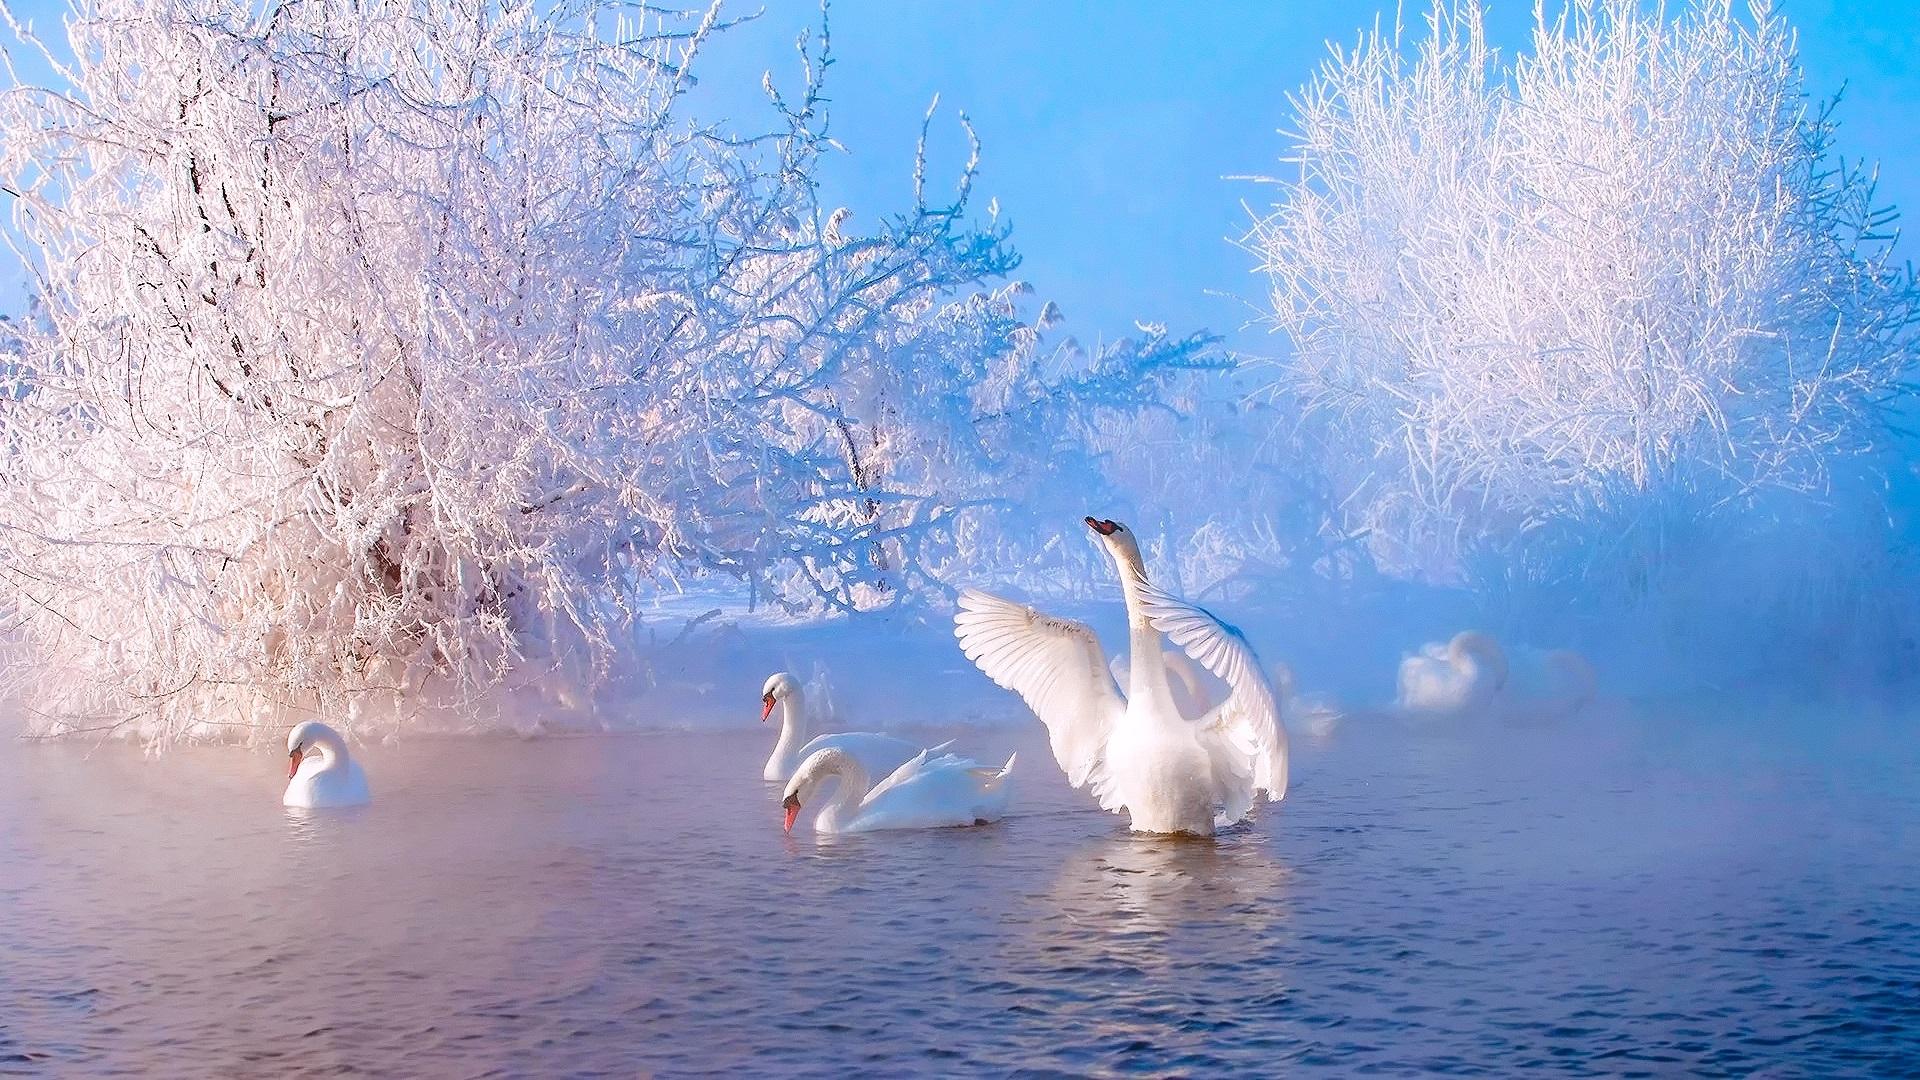 Beautiful-winter-morning-lake-trees-snow-white-swans_1920x1080.jpg